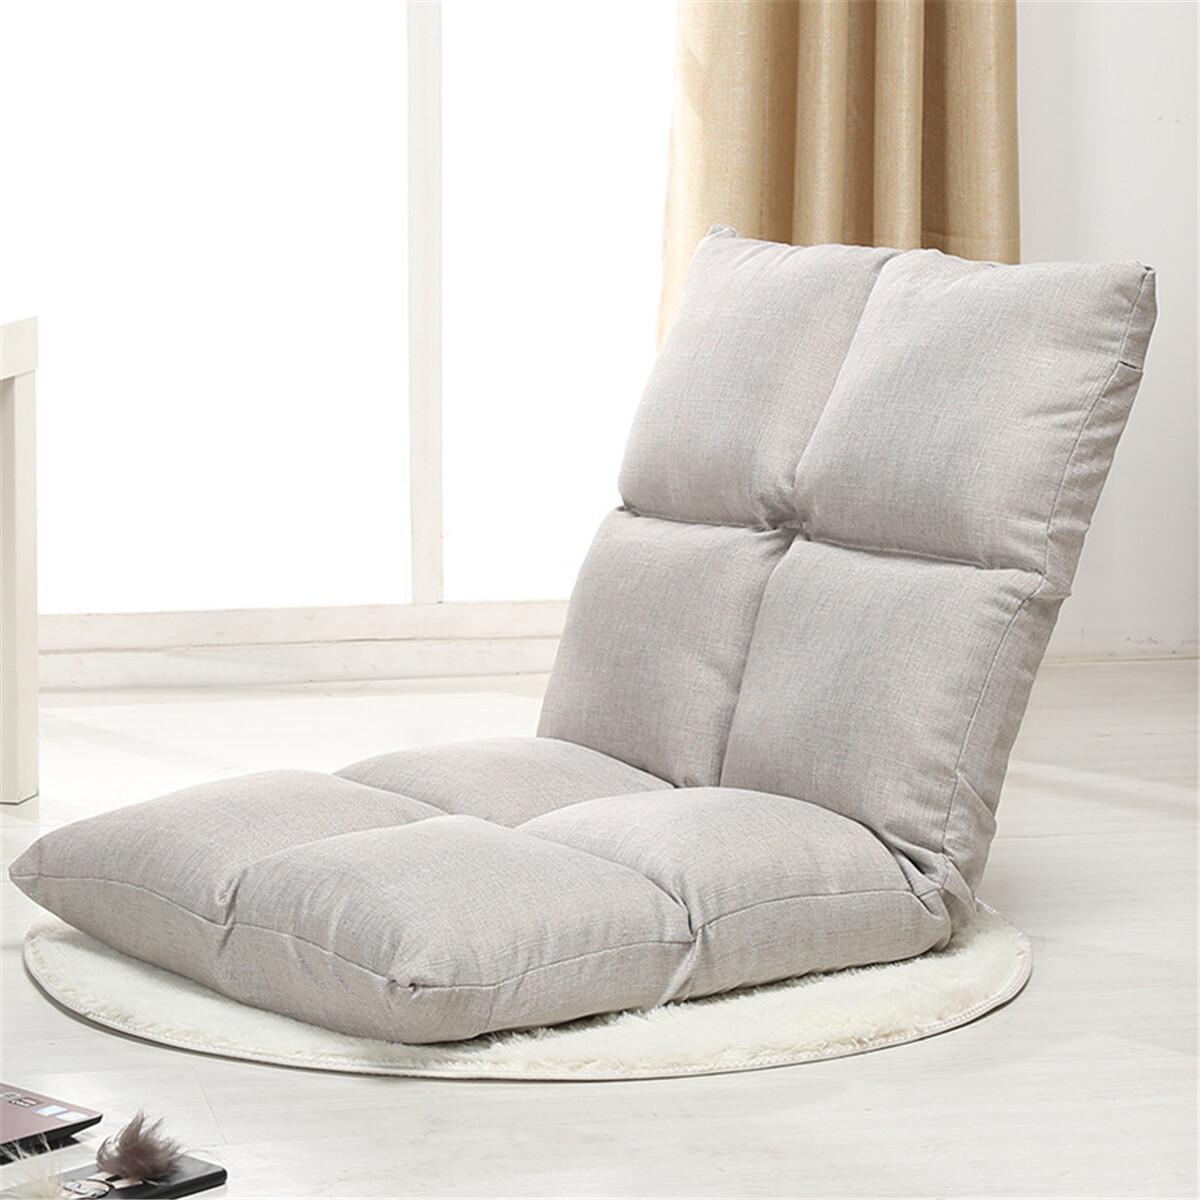 Color : 3# Foldable Lazy Sofa Single Small Sofa Floor Sofa Recliner Bed Backrest Chair Lazy Floor Sofa